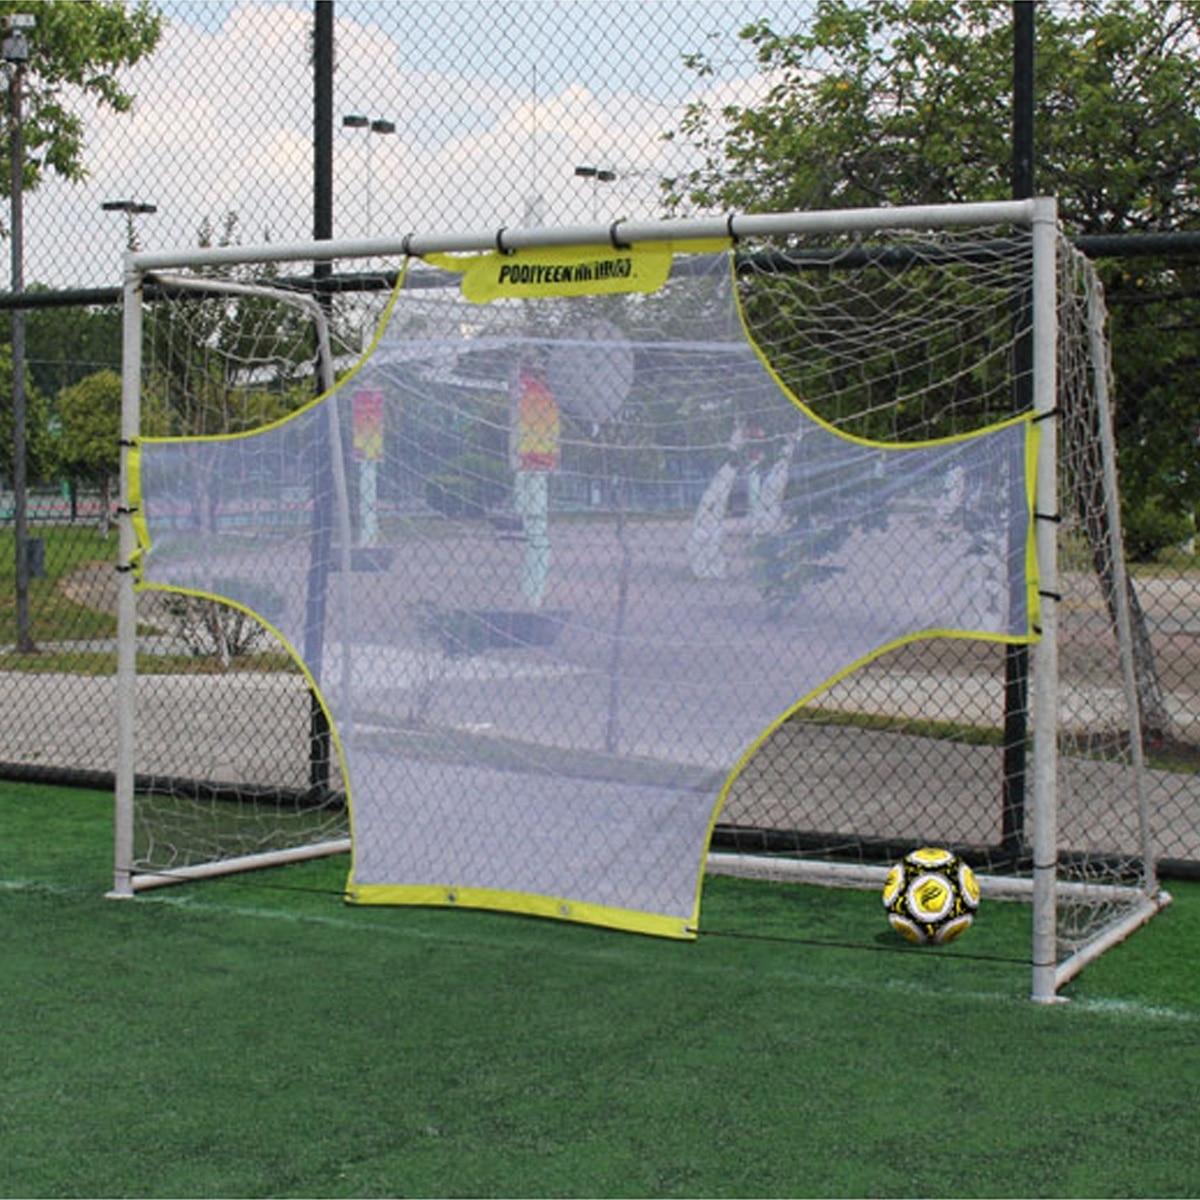 5-11 Person Football Soccer Training Target Portable Practice Training Shot Goal Net Soccer Ball for Children Students Adult